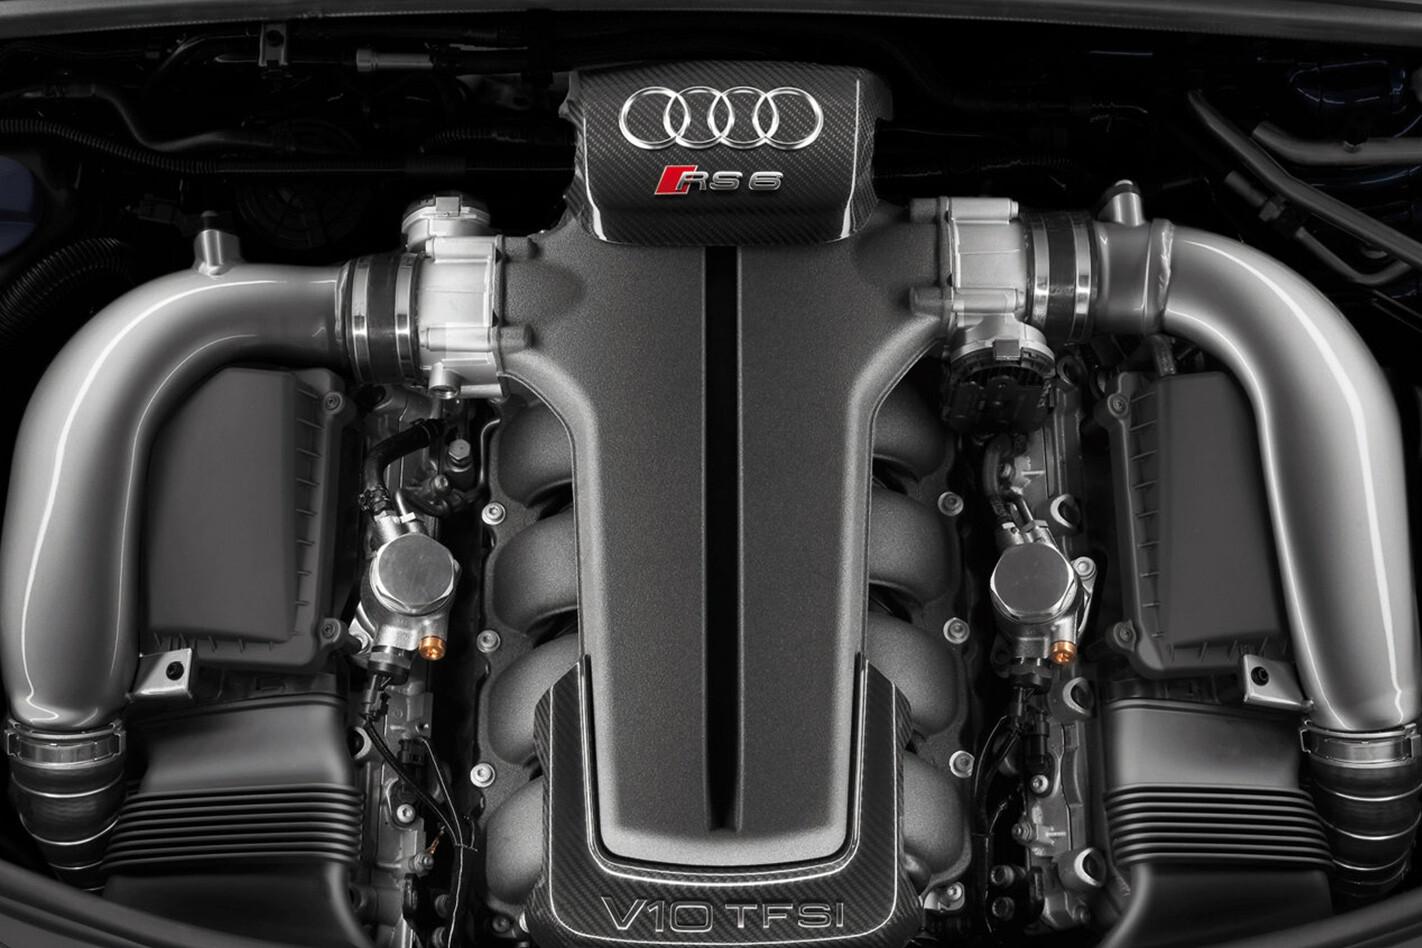 2008 Audi RS6 Avant engine